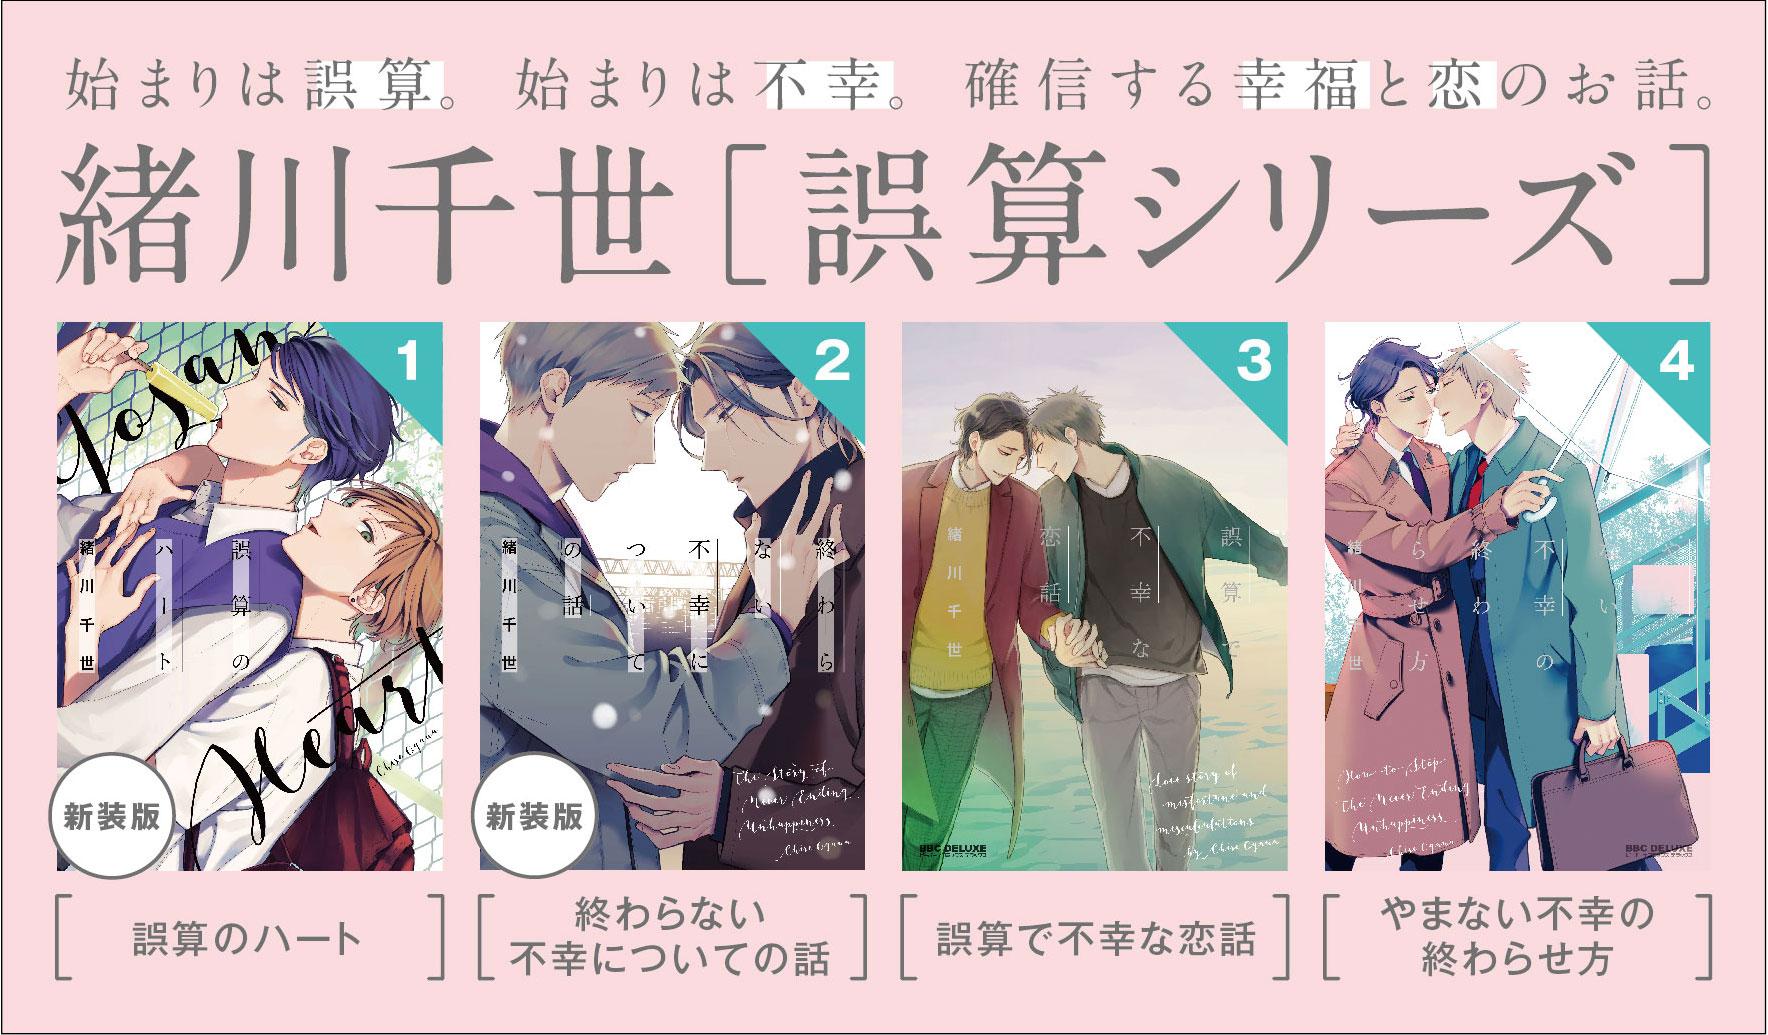 緒川千世先生の大人気「誤算シリーズ」最新刊発売!PV&特典情報公開